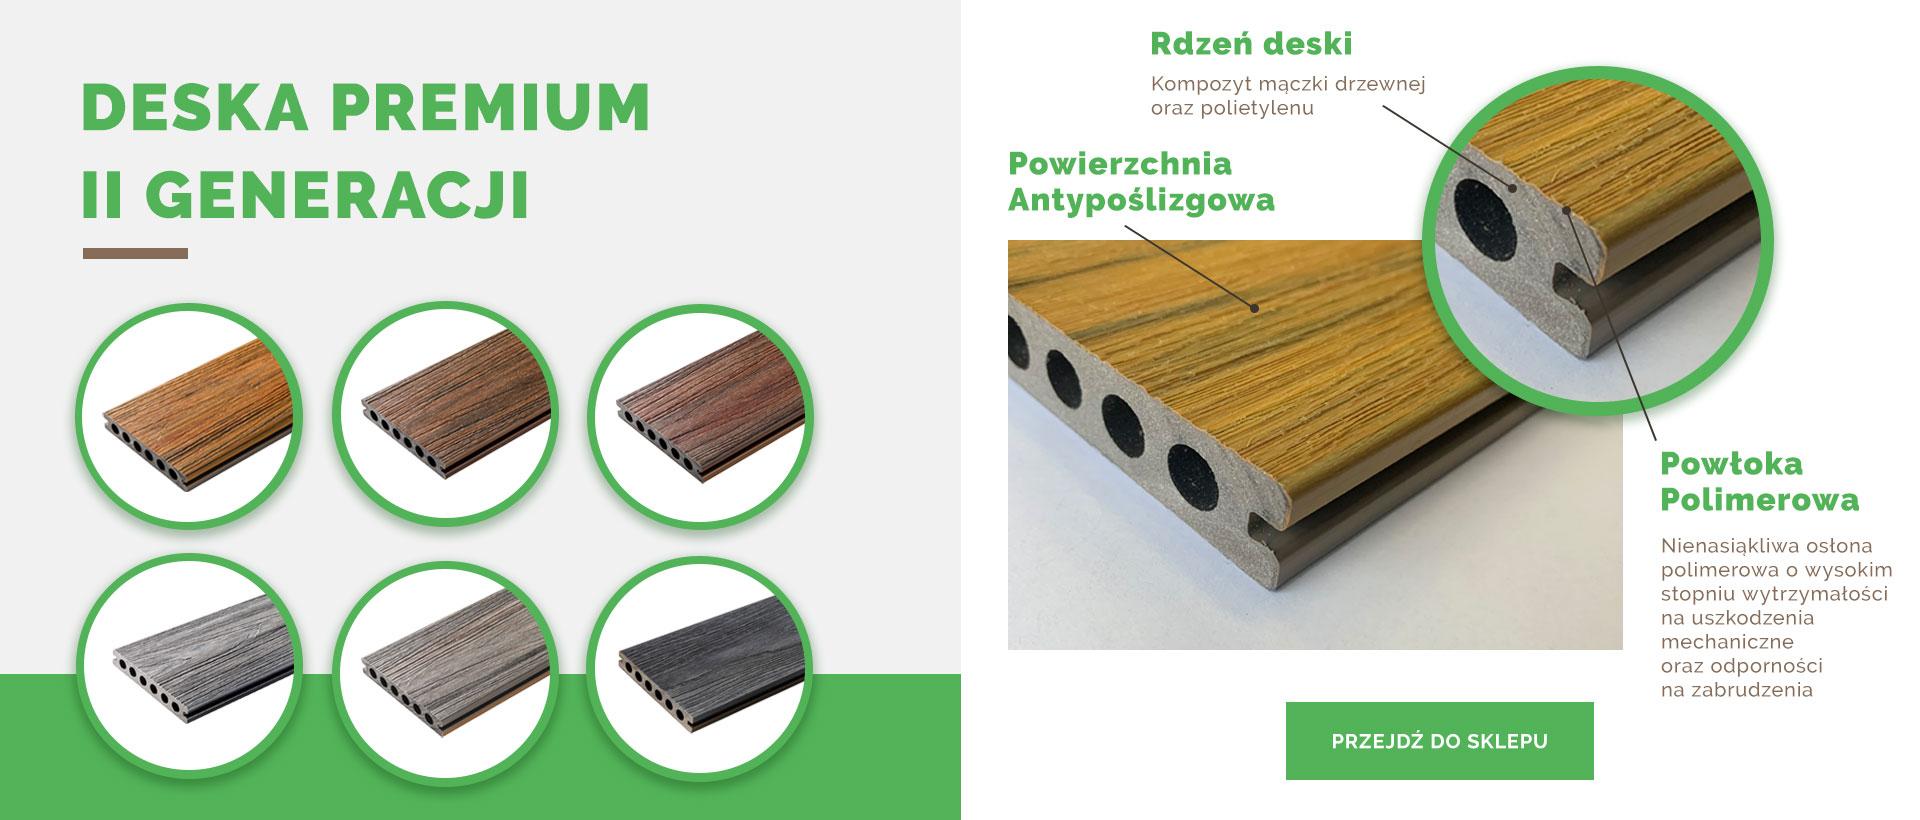 baner liderwood premium - Strona główna